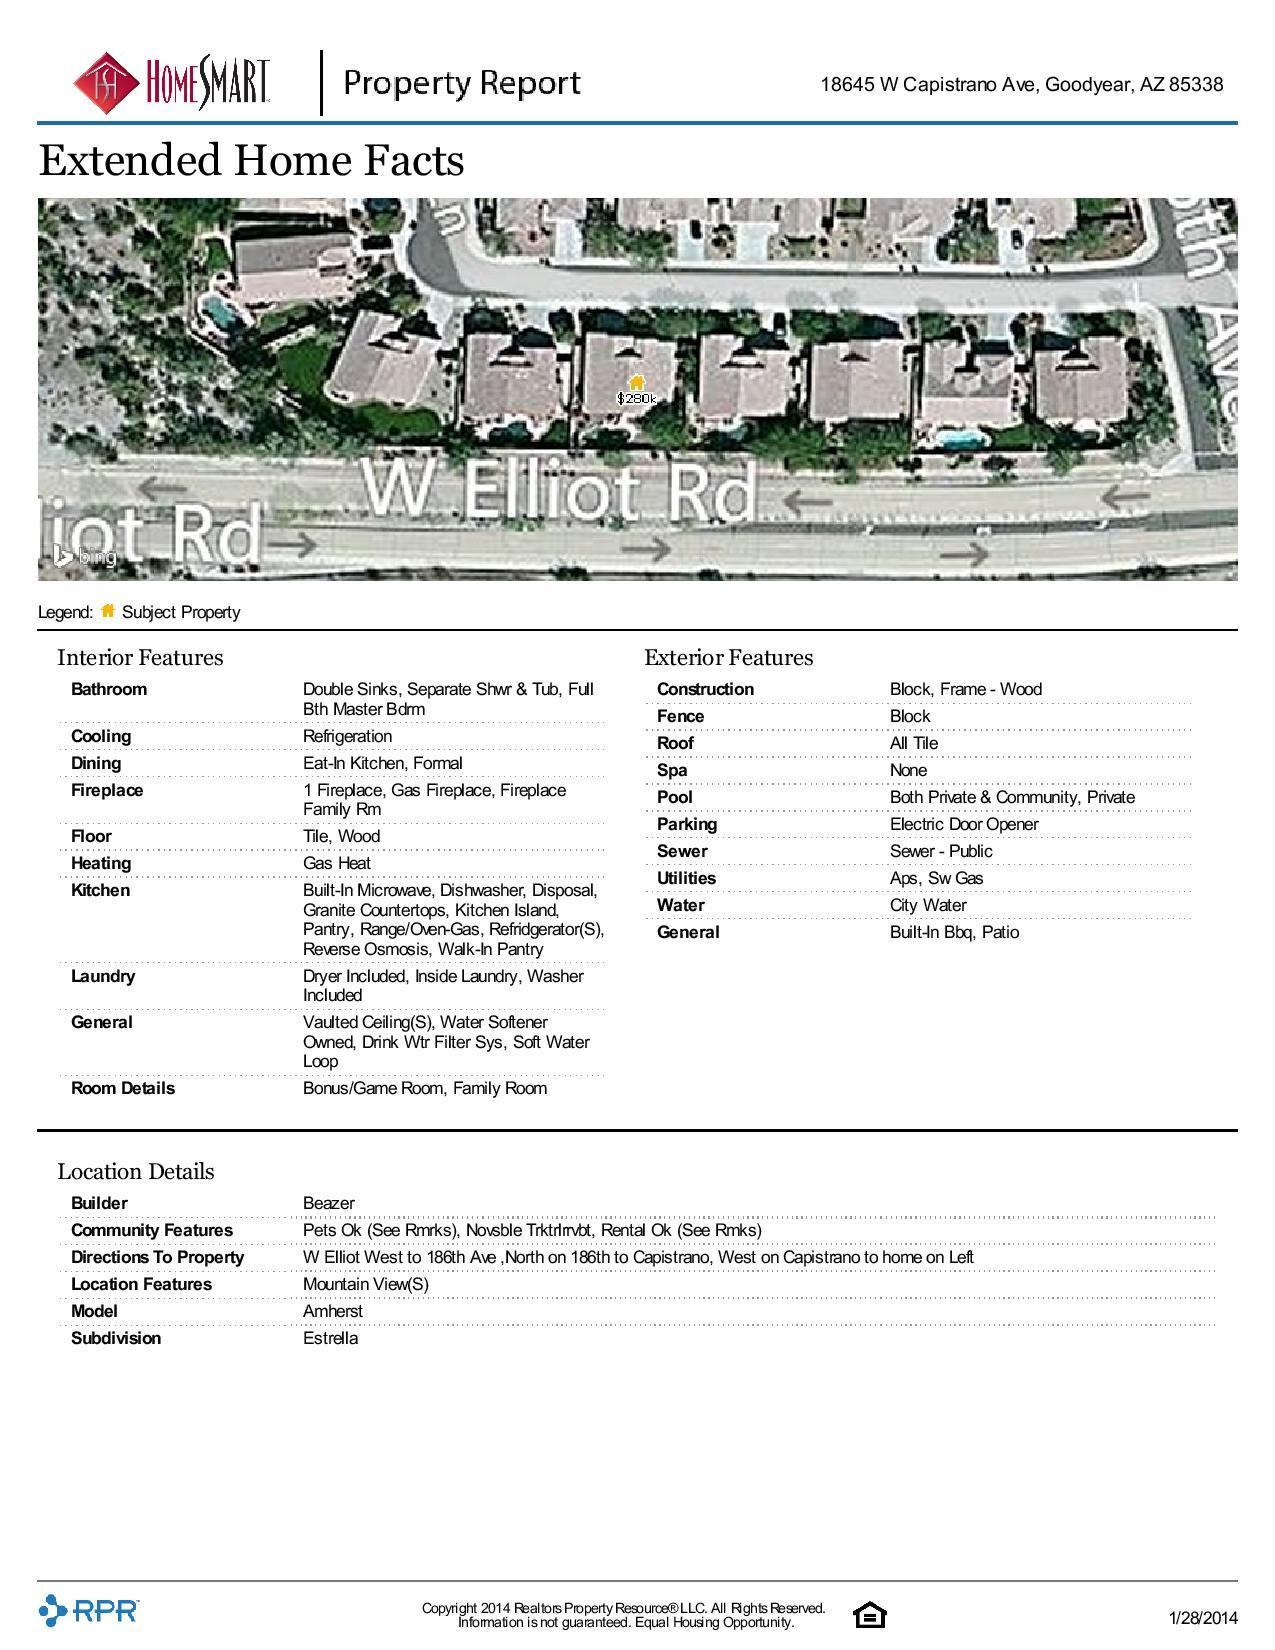 18645-W-Capistrano-Ave-Goodyear-AZ-85338.pdf-page-004